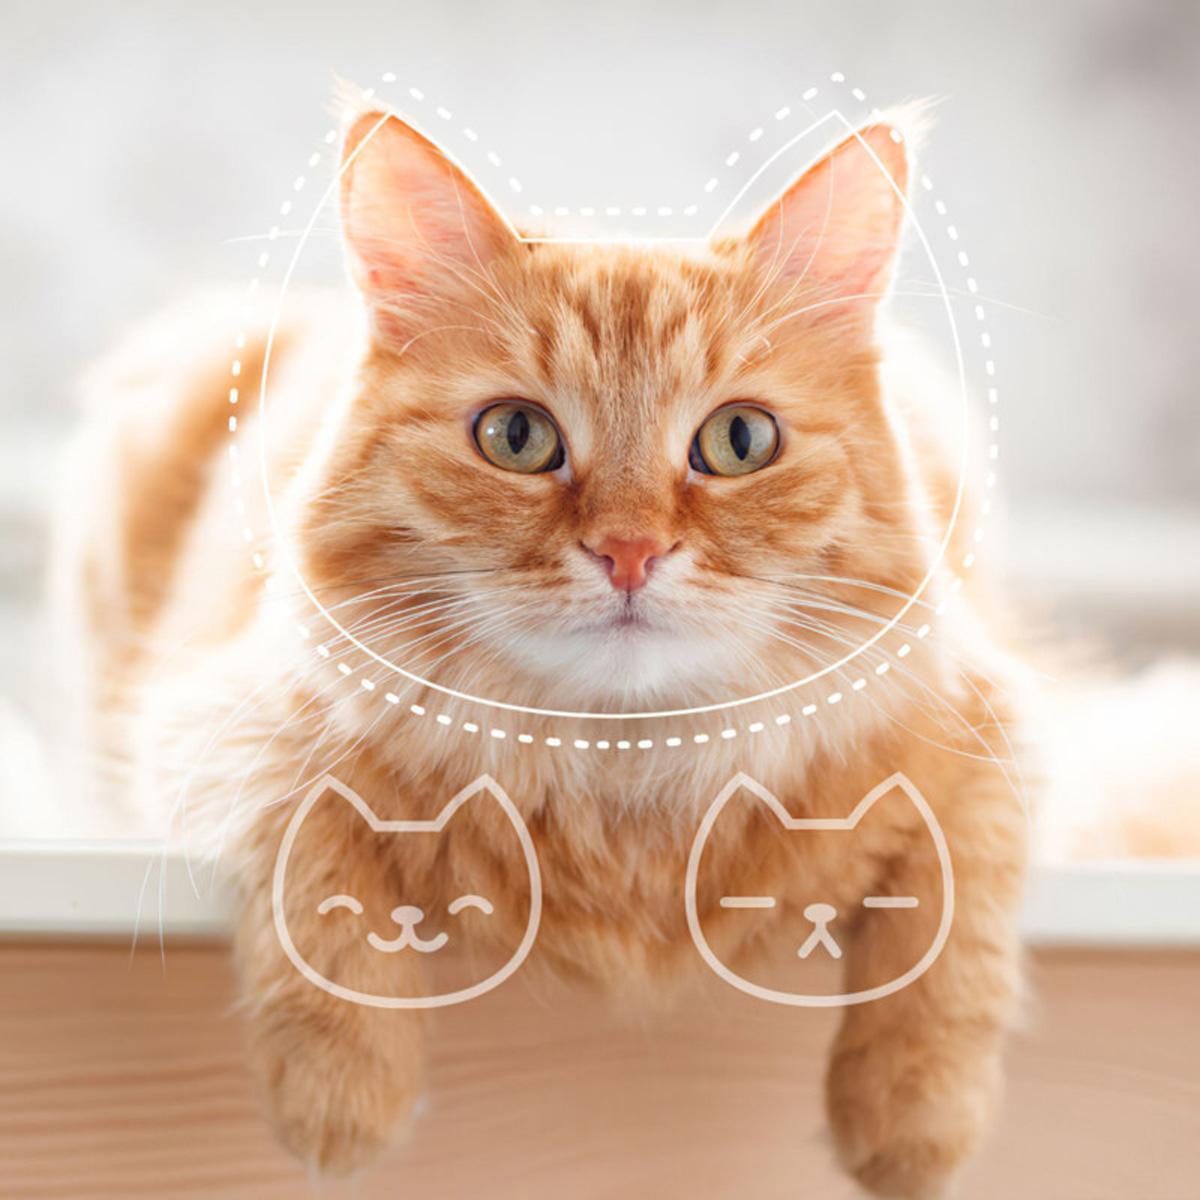 Tably App AI Smartphone Camera Identify Cat's Mood